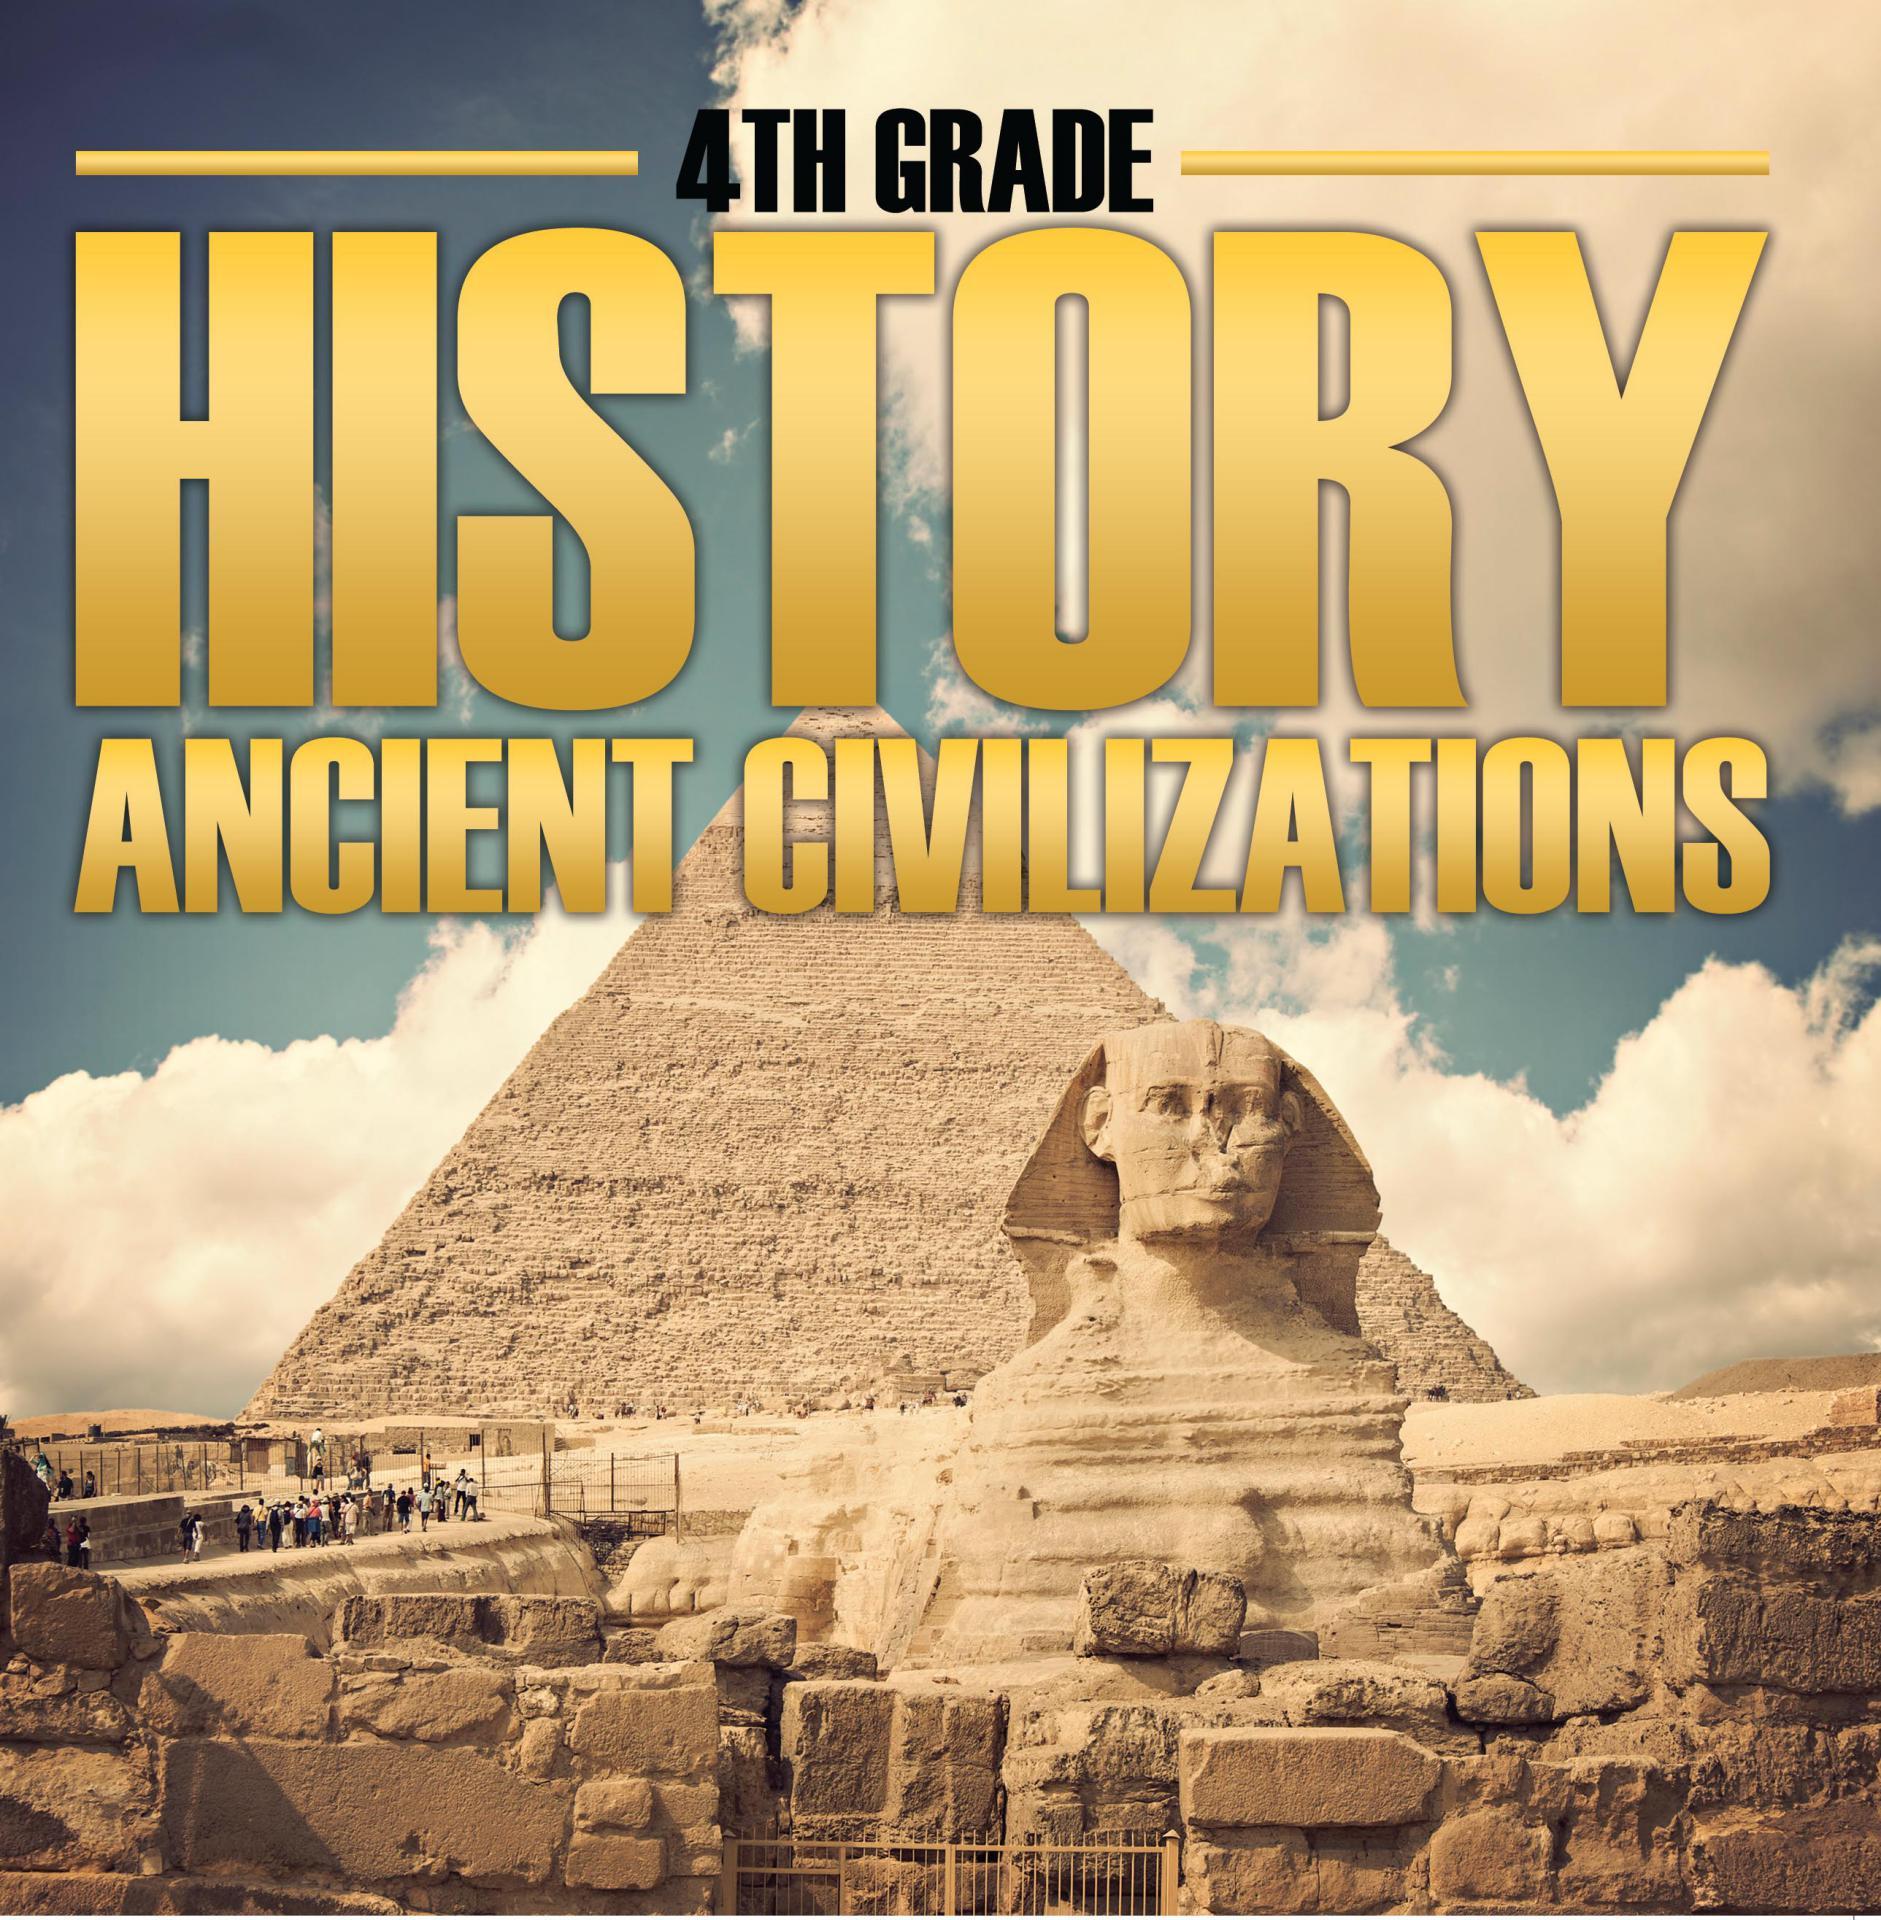 4th Grade History: Ancient Civilizations Fourth Grade Books for Kids